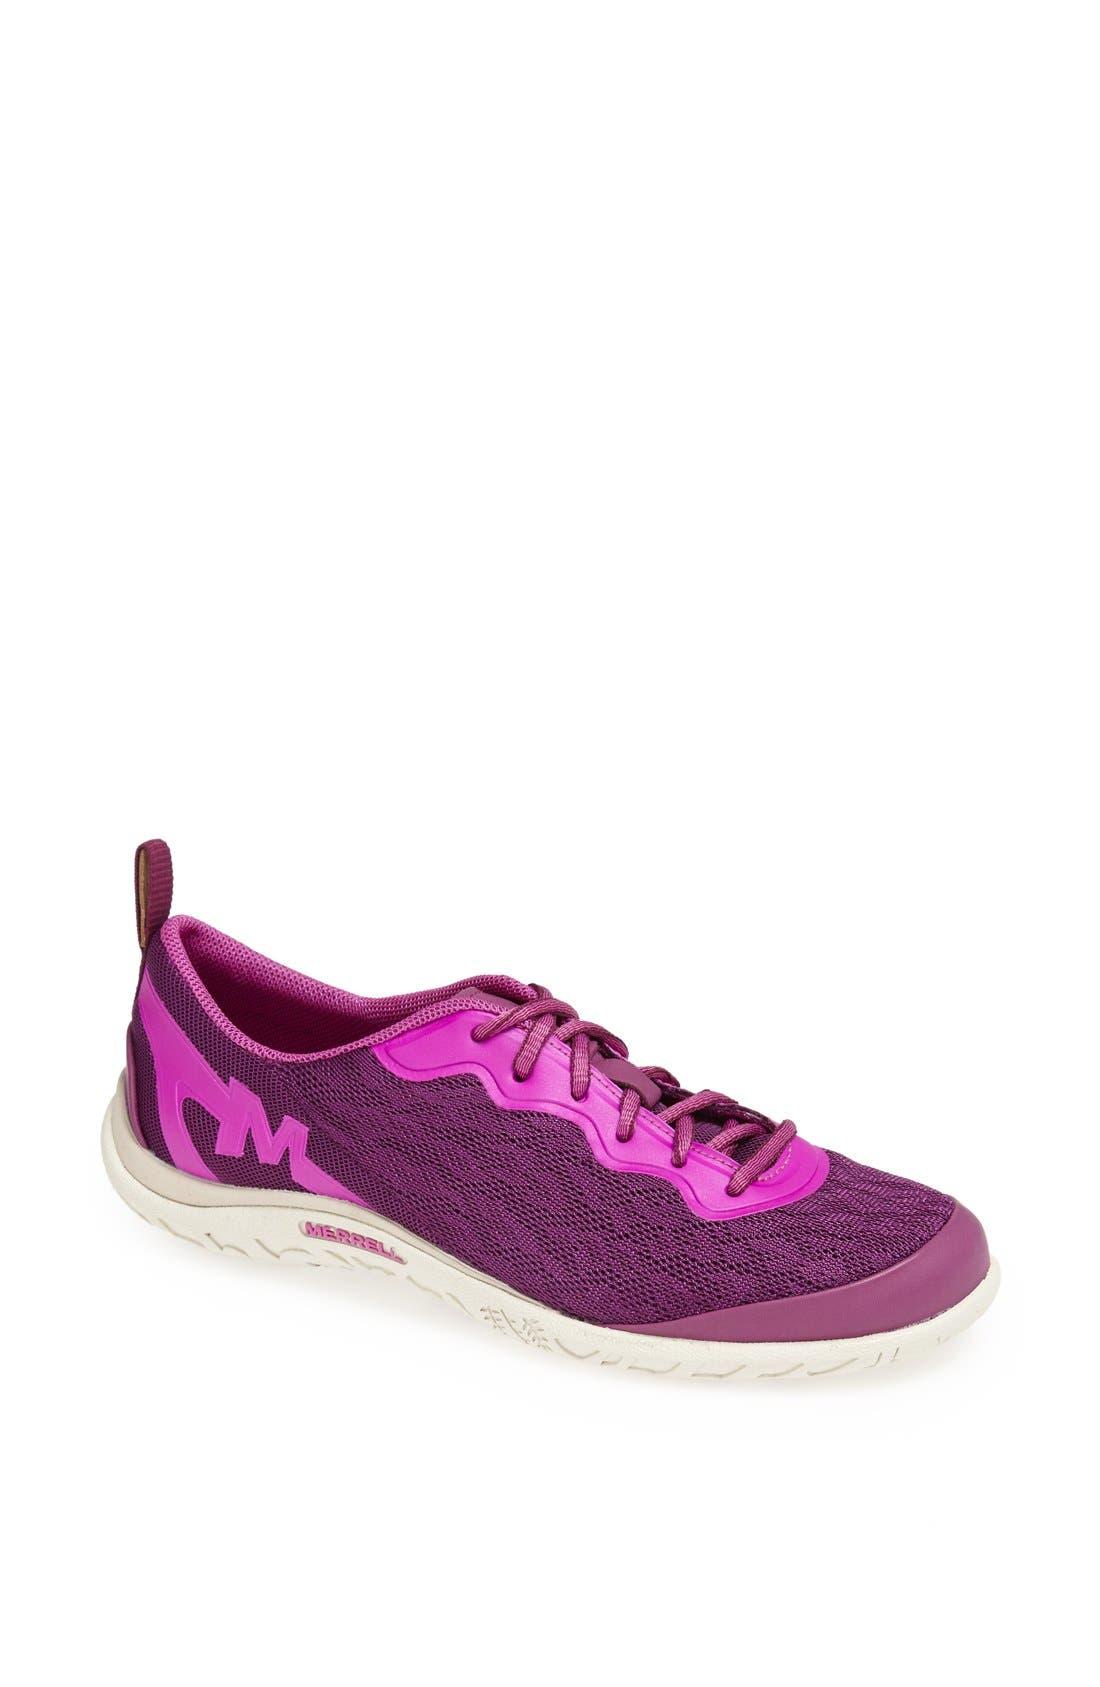 Alternate Image 1 Selected - Merrell 'Enlighten Shine Breeze' Sneaker (Women)